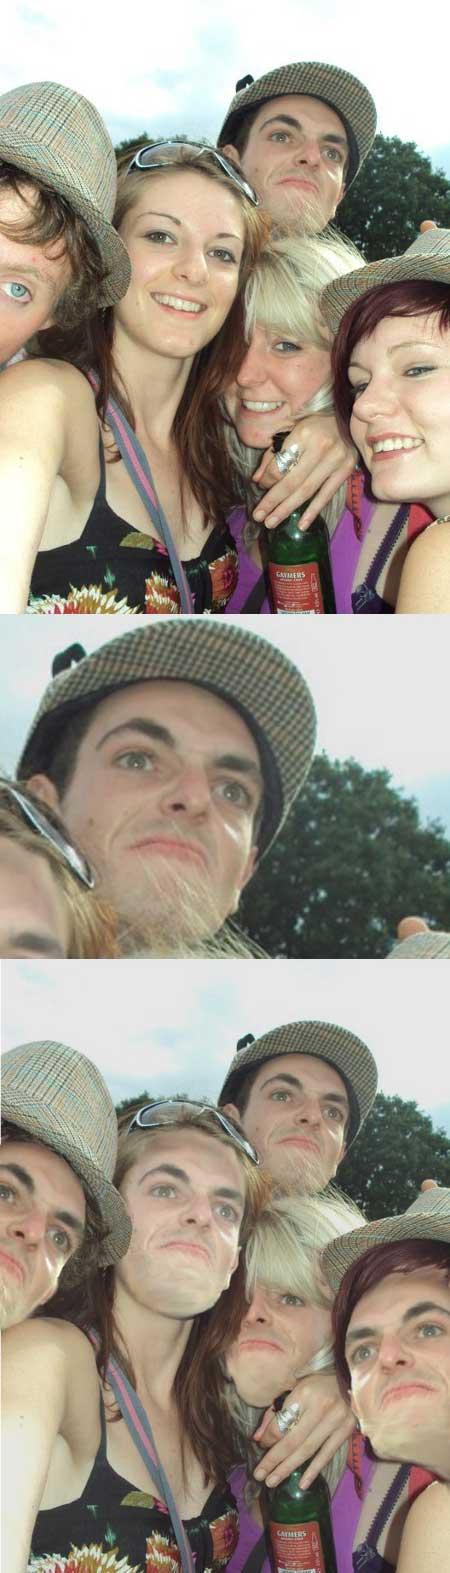 Facebombs (17 pics)